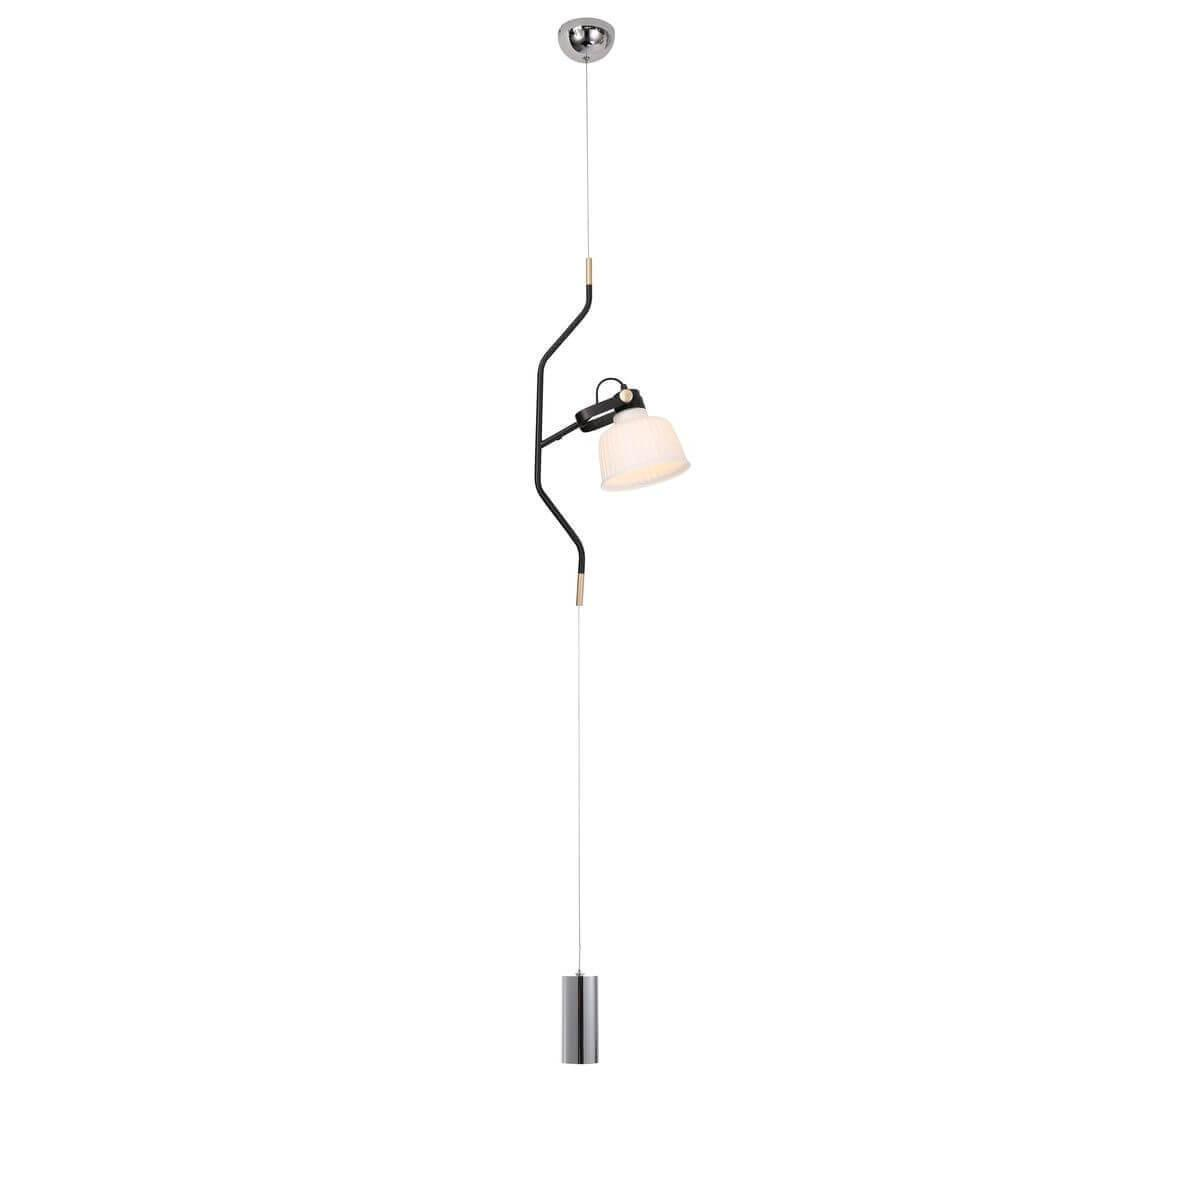 Подвесной светильник Omnilux OML-28216-01, E14, 40 Вт